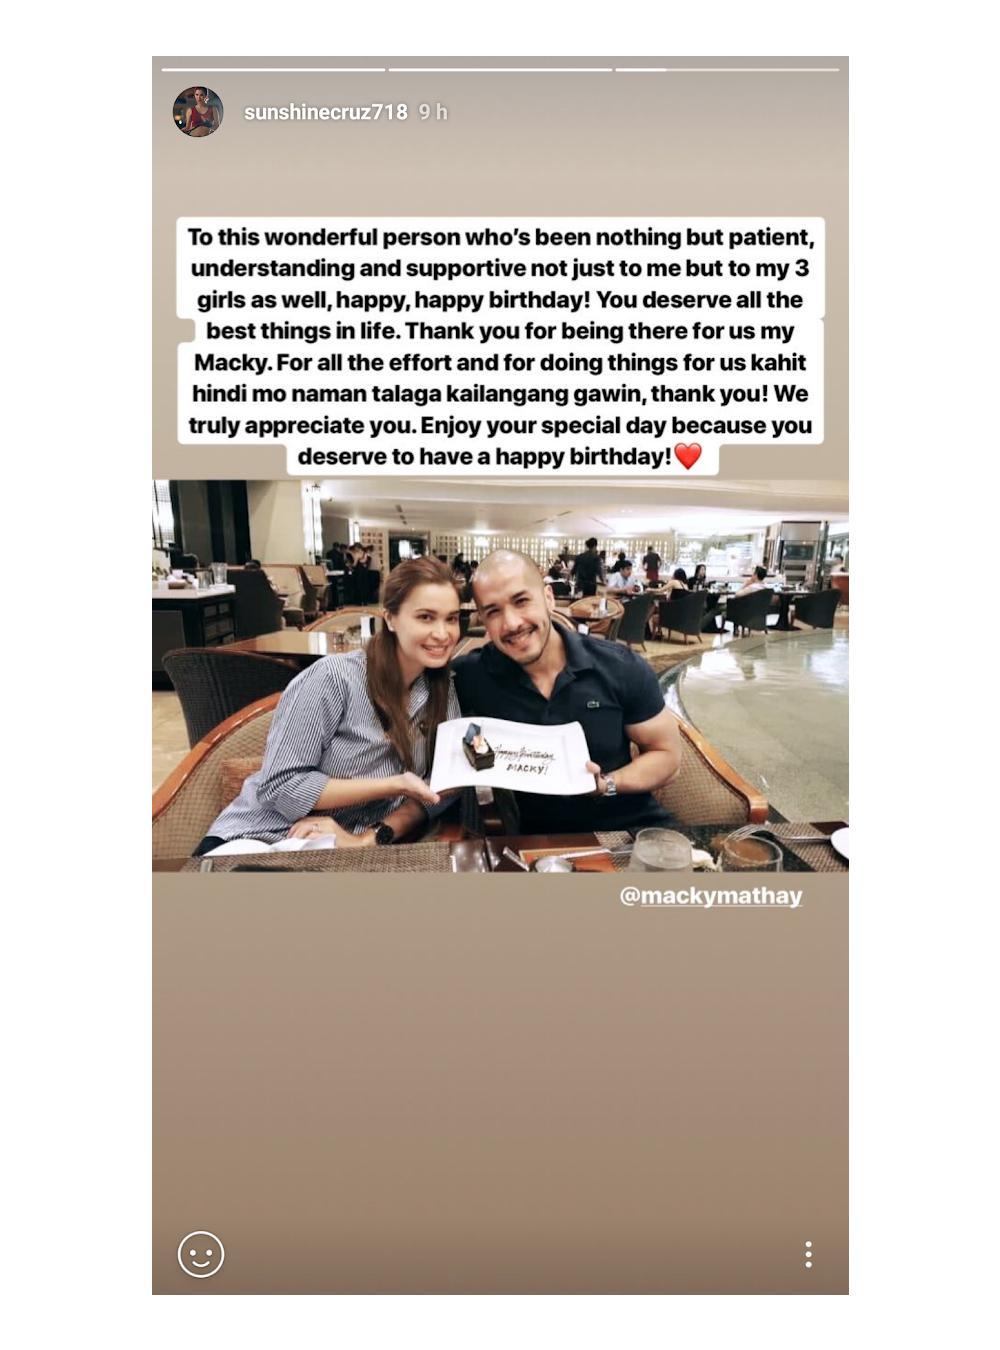 Sunshine Cruz Thanks Macky Mathay On Her Birthday Message For Him